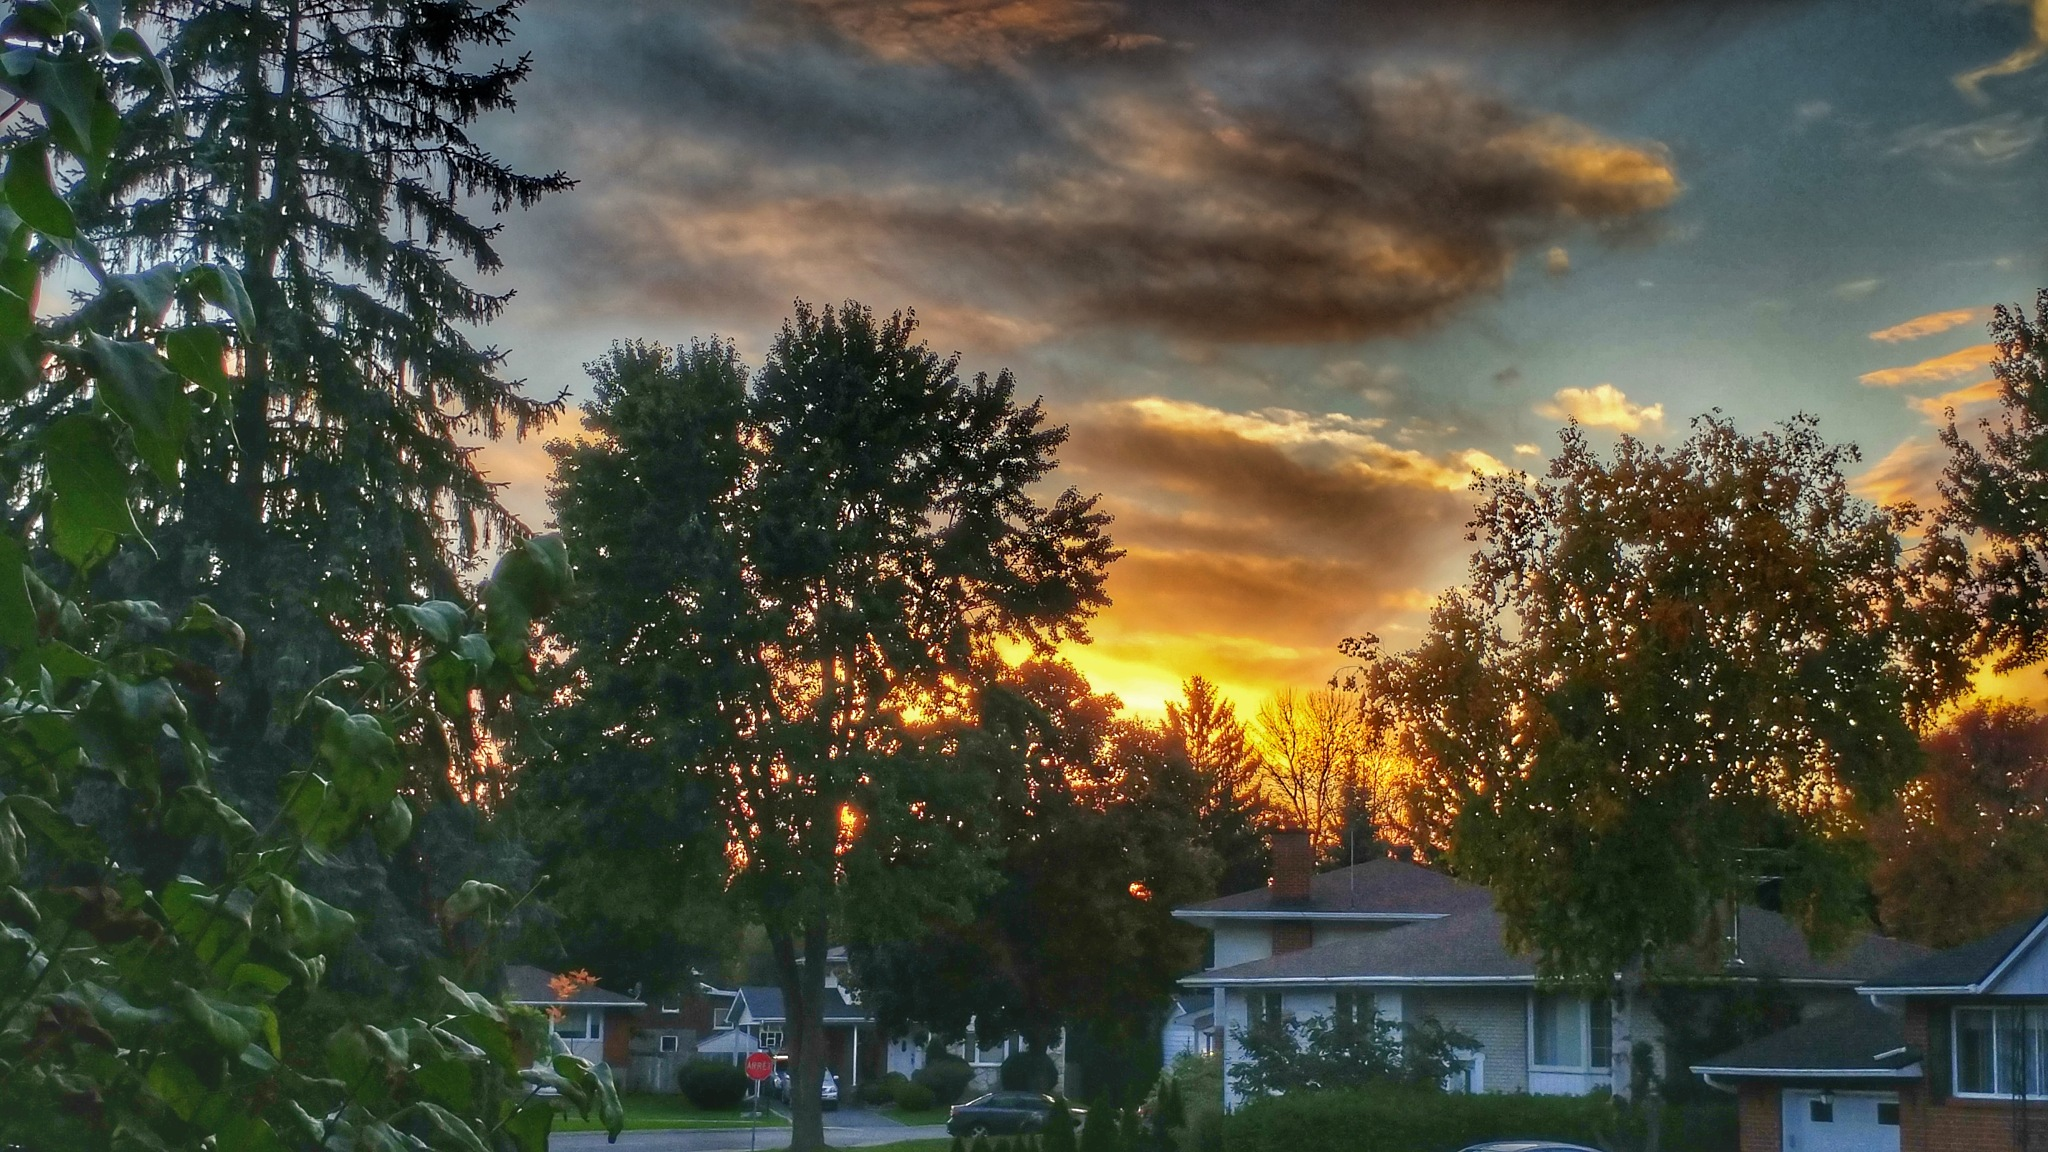 Suburban Sunset by Janice Bradford